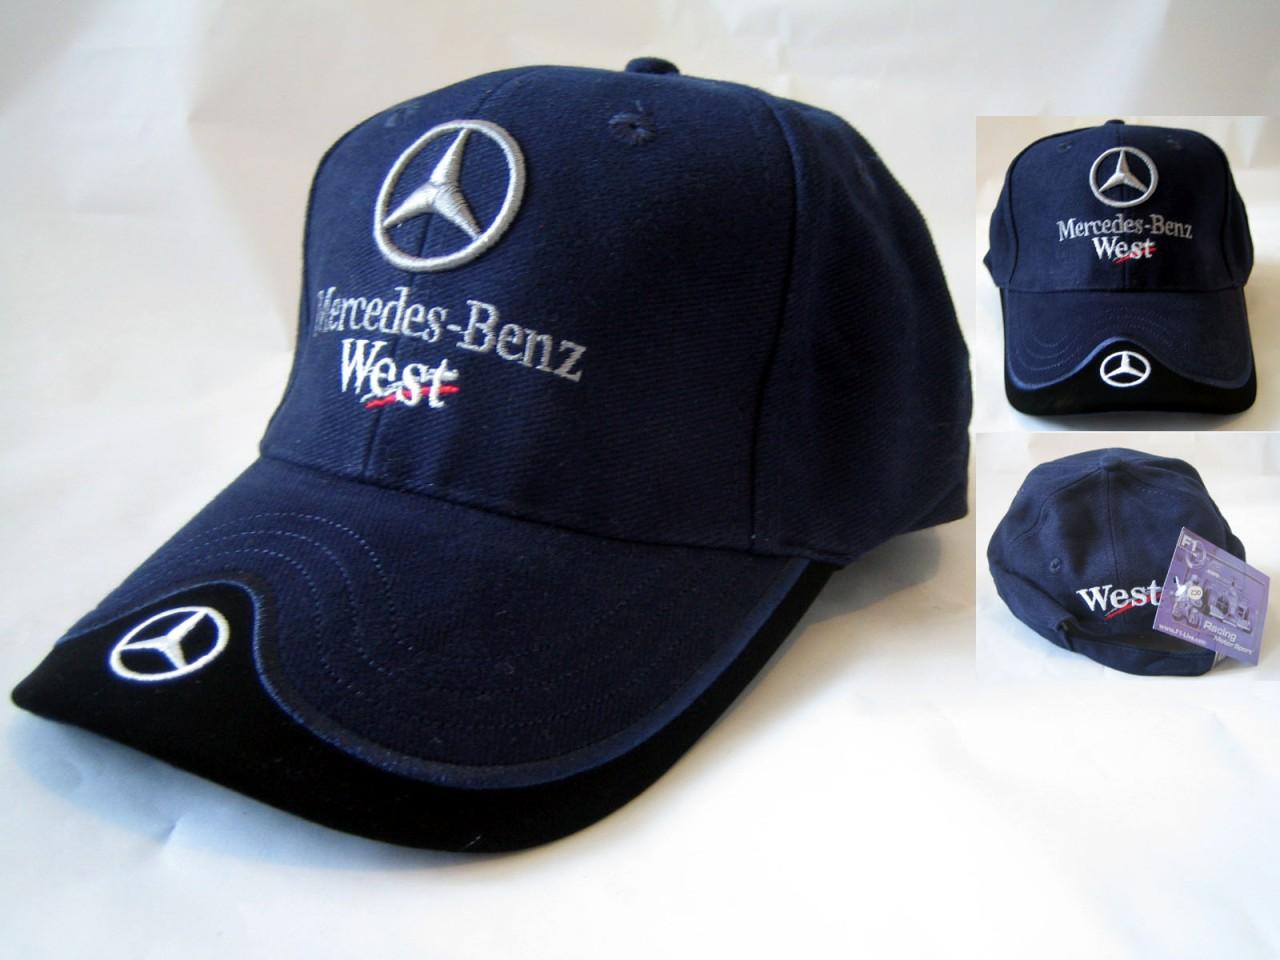 Mercedes benz golf caps 2017 for Mercedes benz amg hat